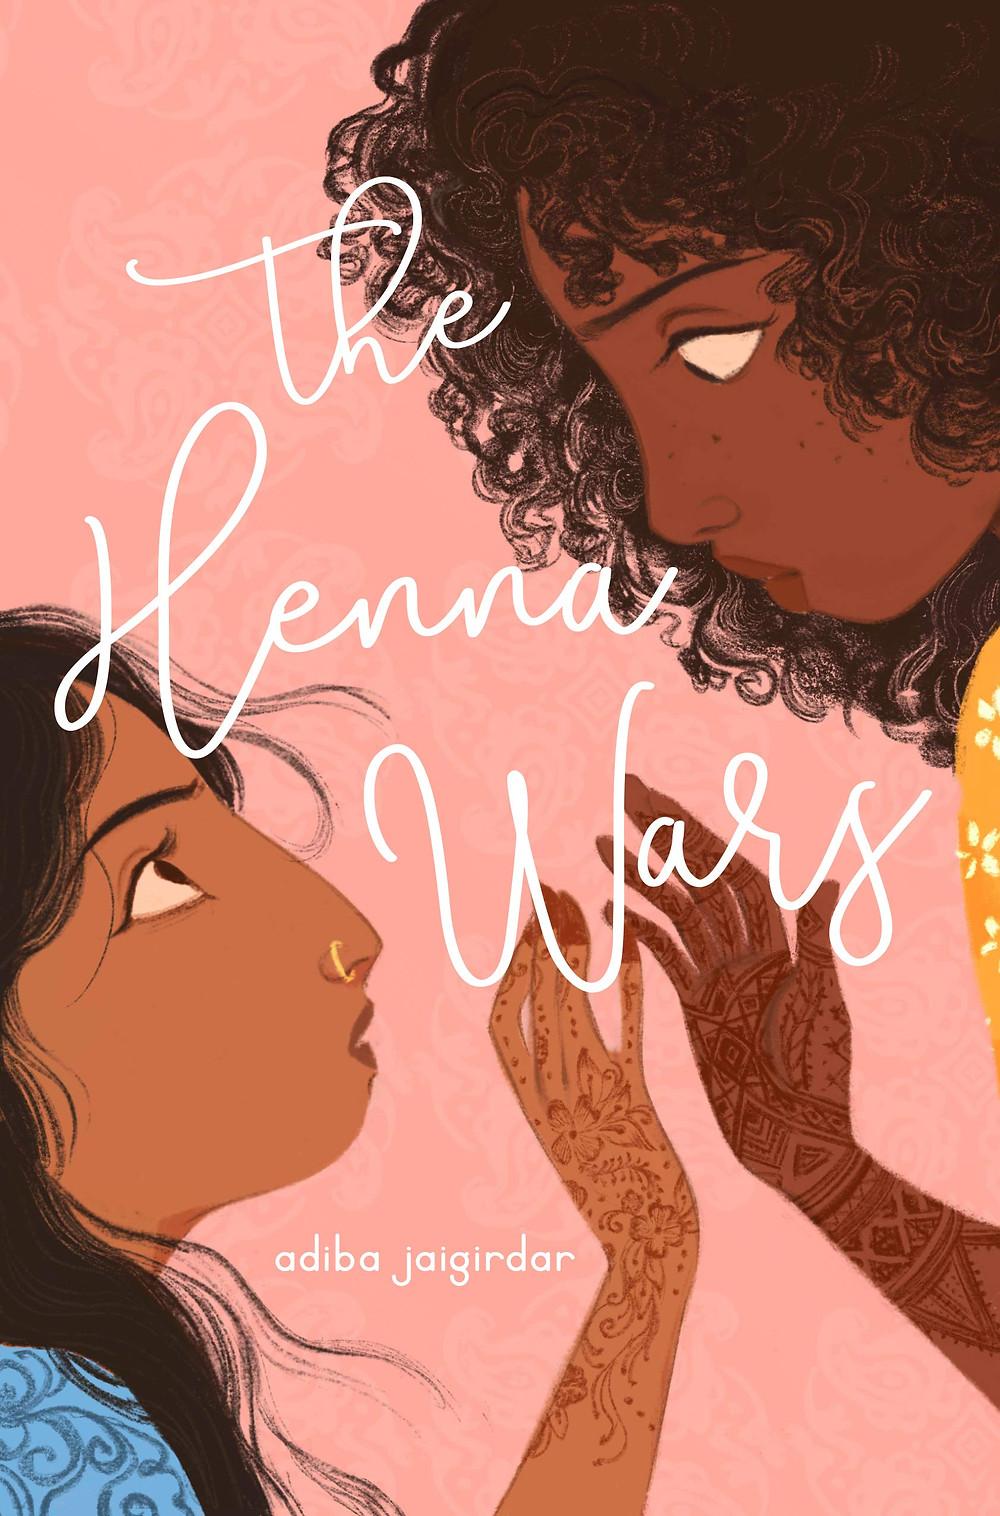 The Henna Wars by Adiba Jaigirdar